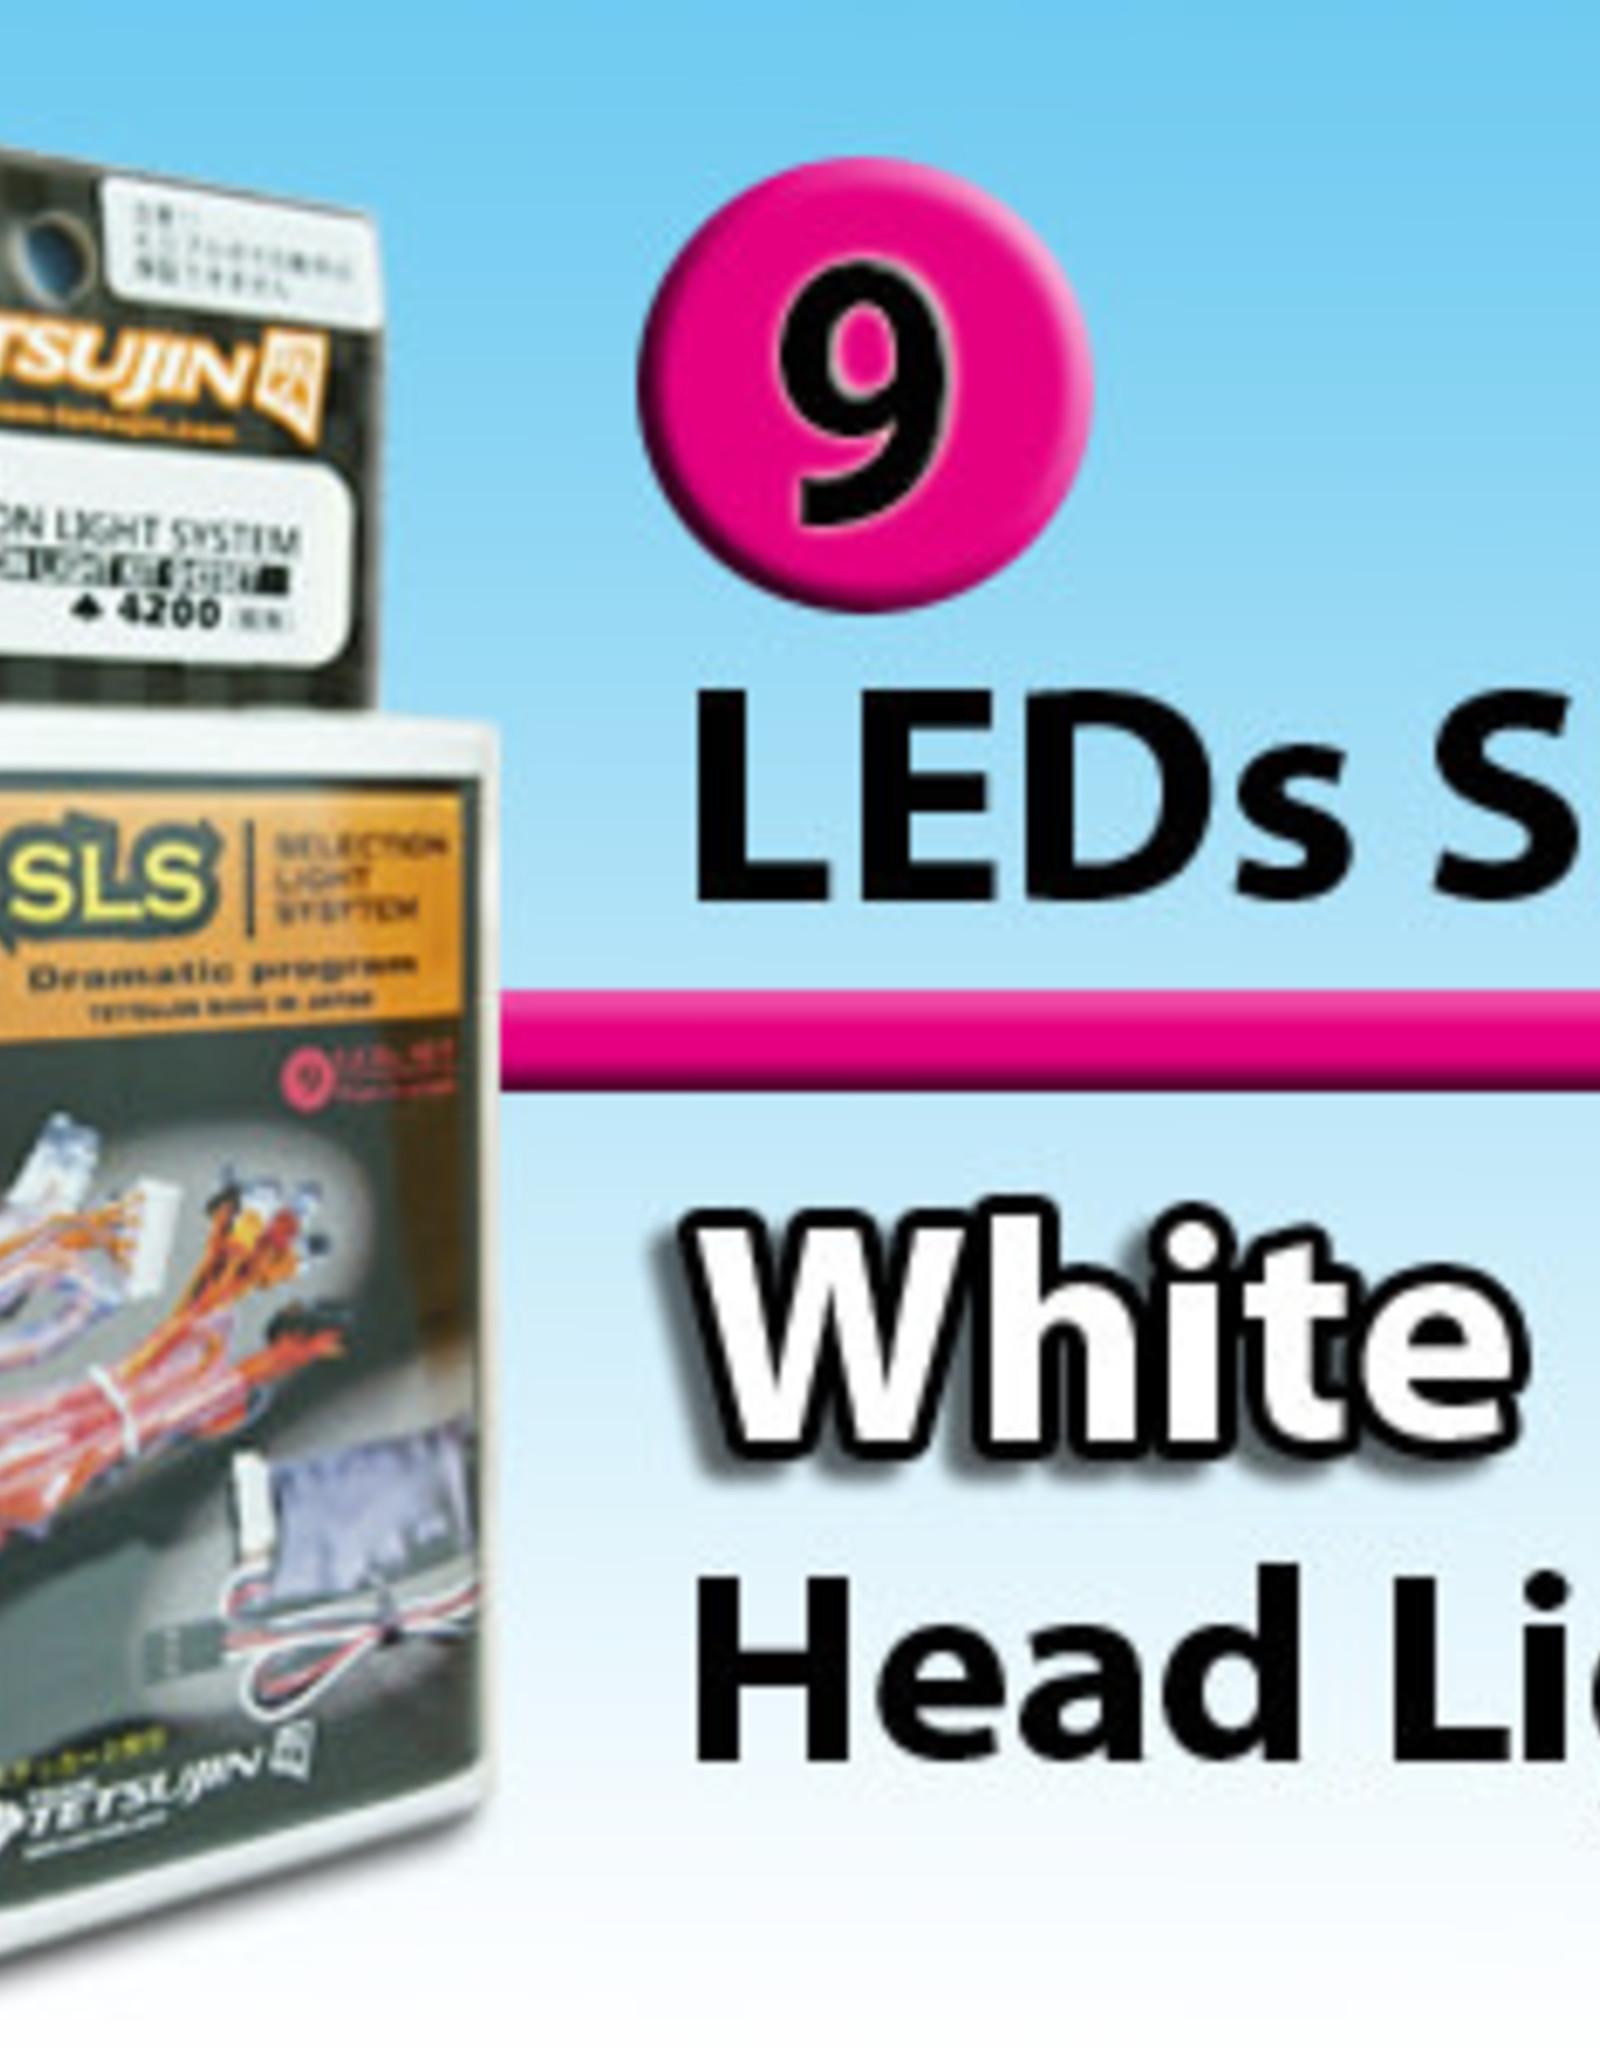 Tetsujin TT-7816 ''SLS'' 9 LED set (Front 4 Rear 5) for RC Car by Tetsujin